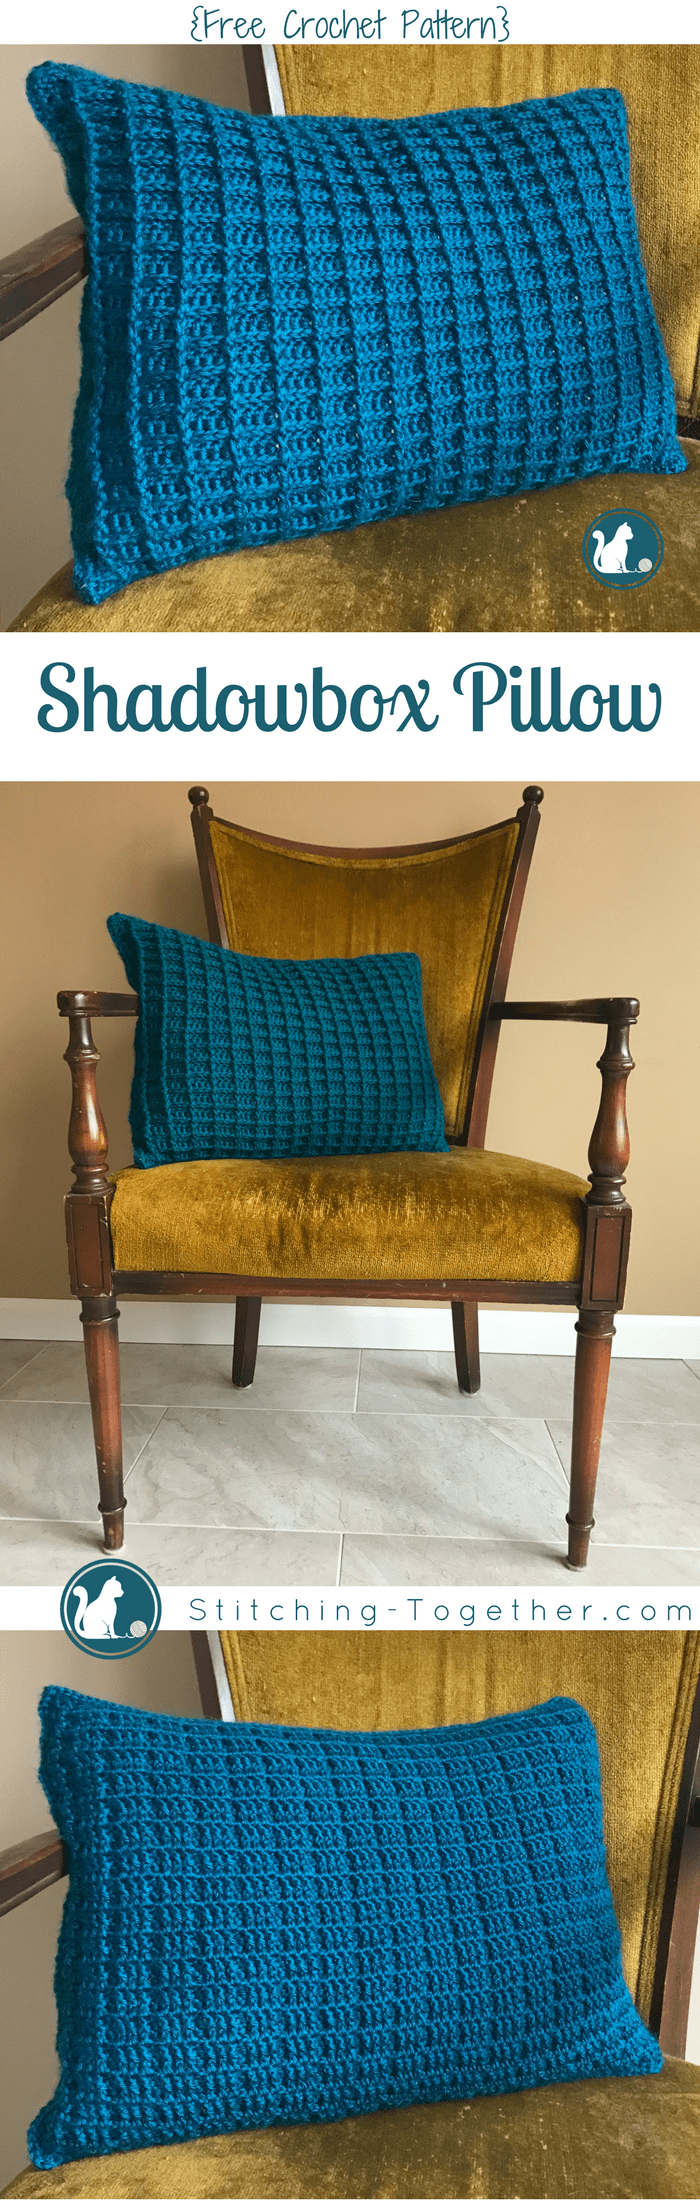 Shadow Box Pillow Cover {free crochet pattern}